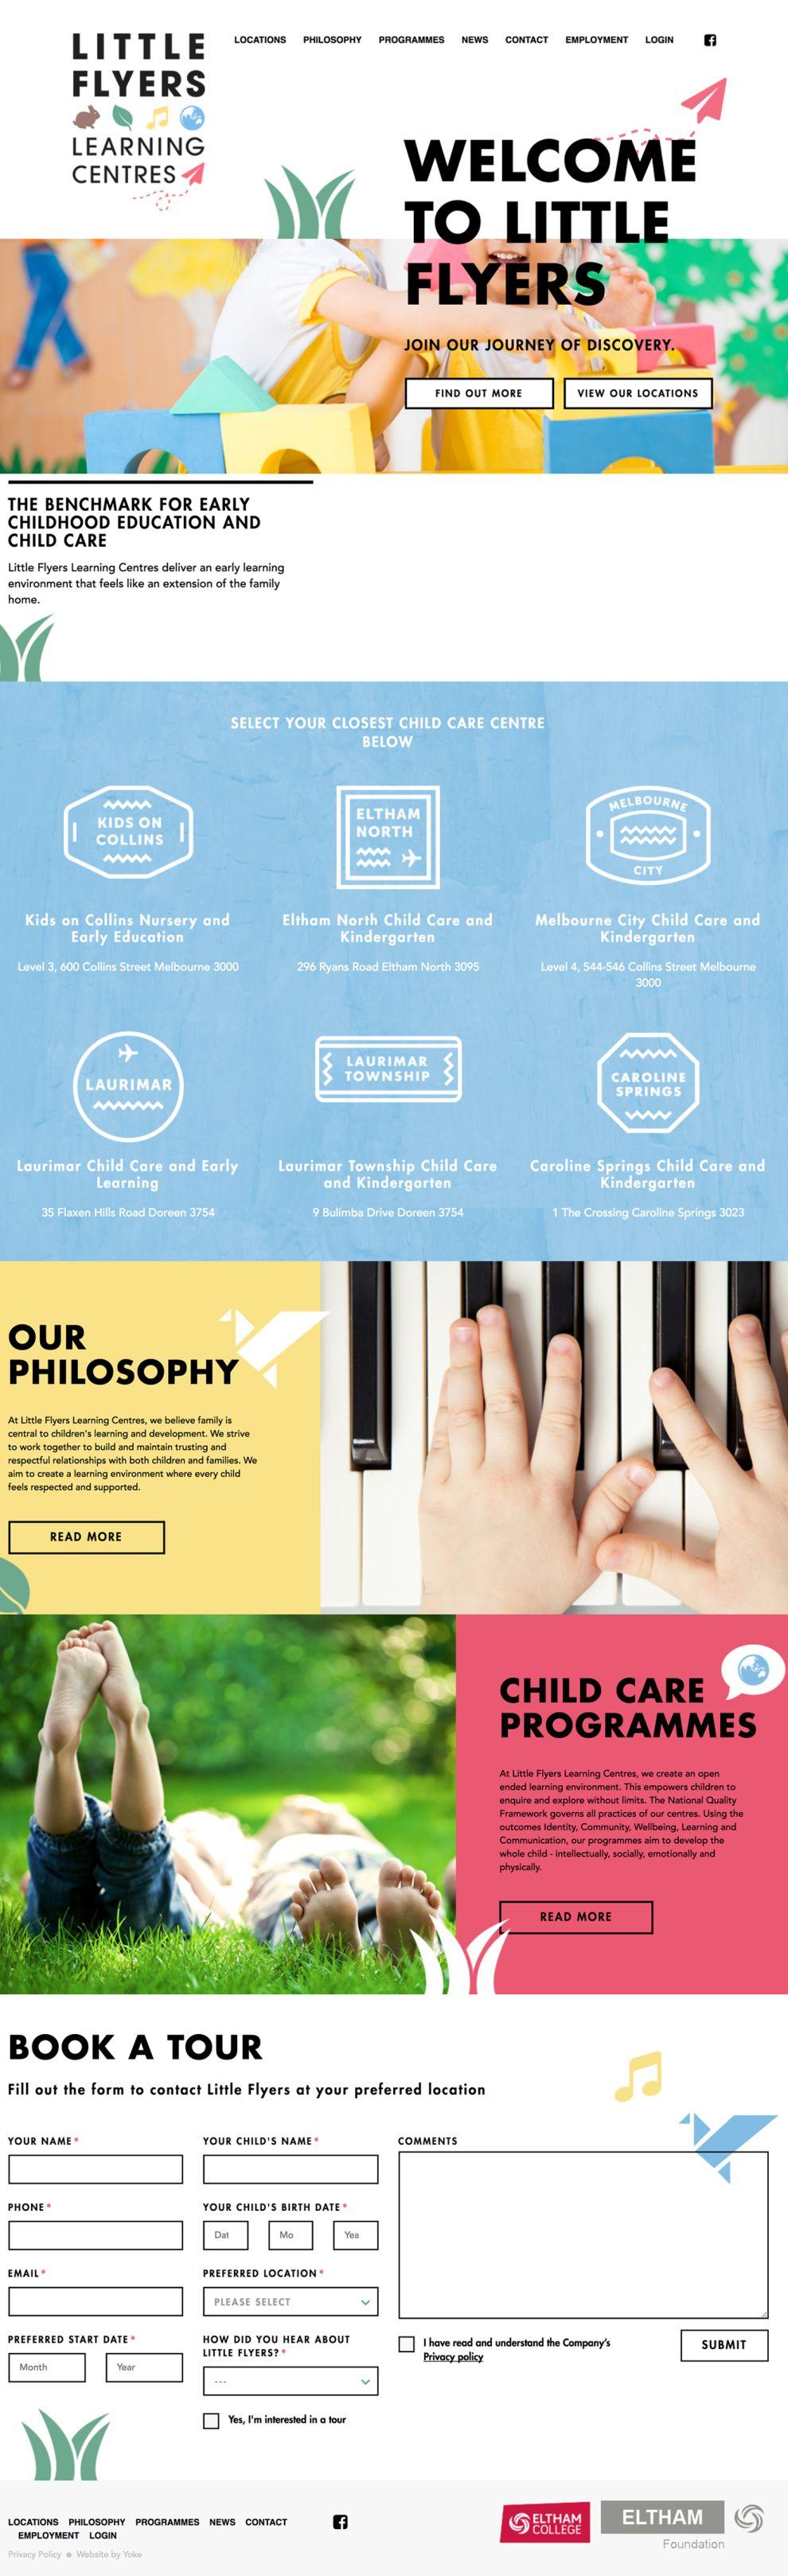 Little Flyers Learning Center Colorful Website Design